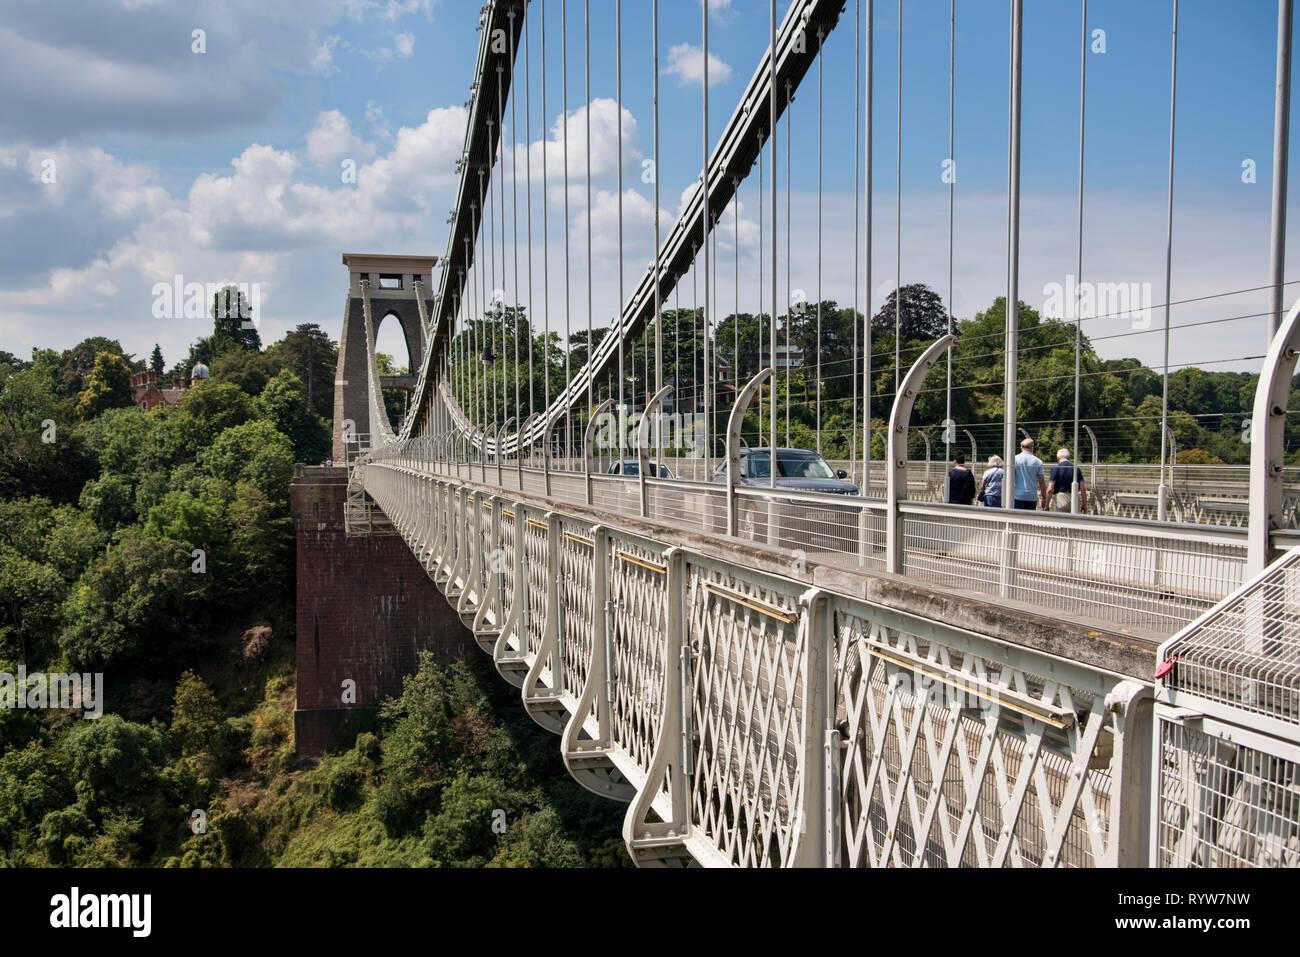 Pedestrians and cars on the Clifton Suspension Bridge spanning Avon Gorge and River Avon, Bristol, UK Stock Photo